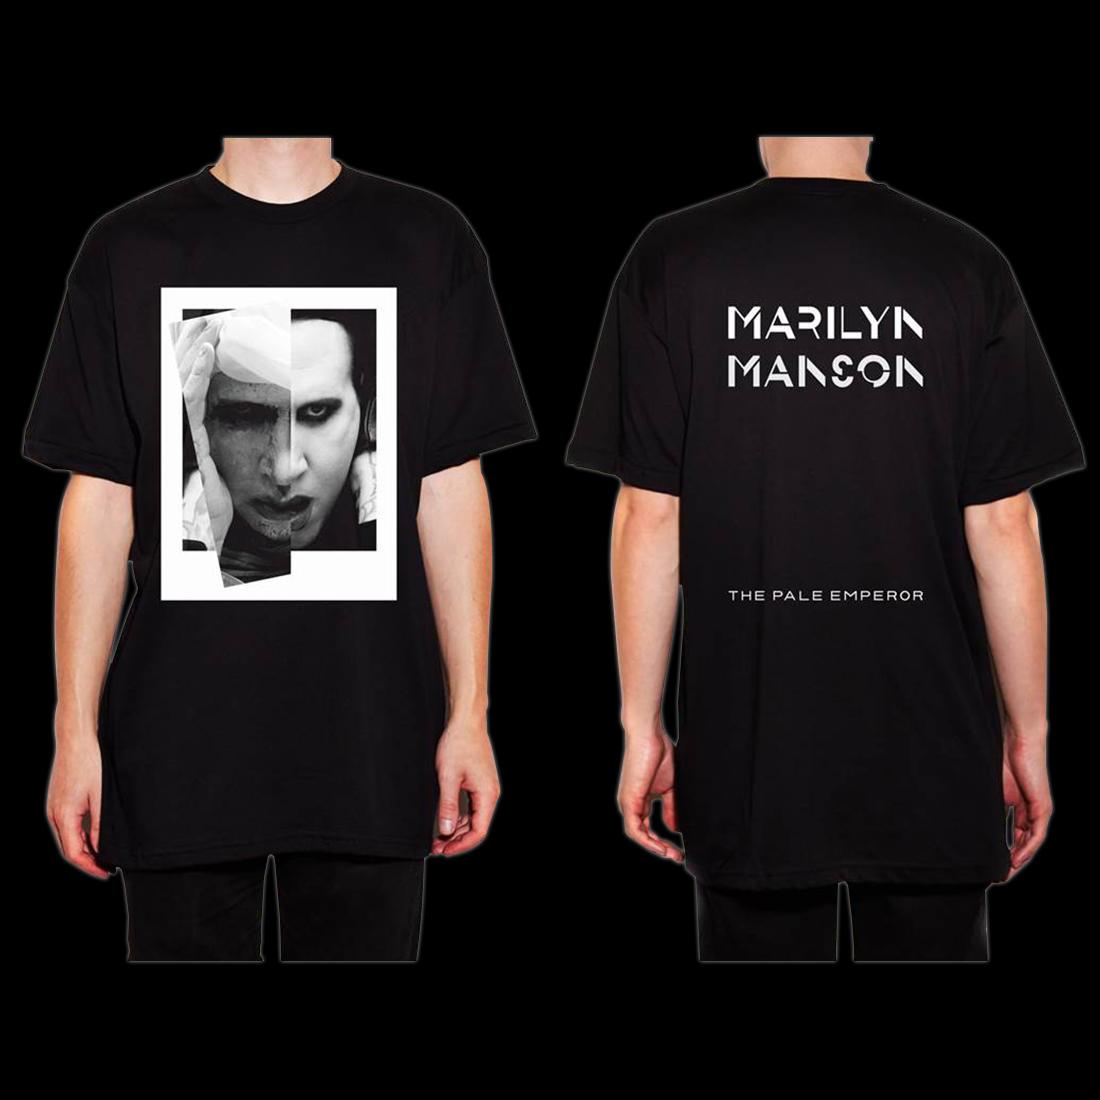 marilyn manson the pale emperor t shirt shop the bravado. Black Bedroom Furniture Sets. Home Design Ideas